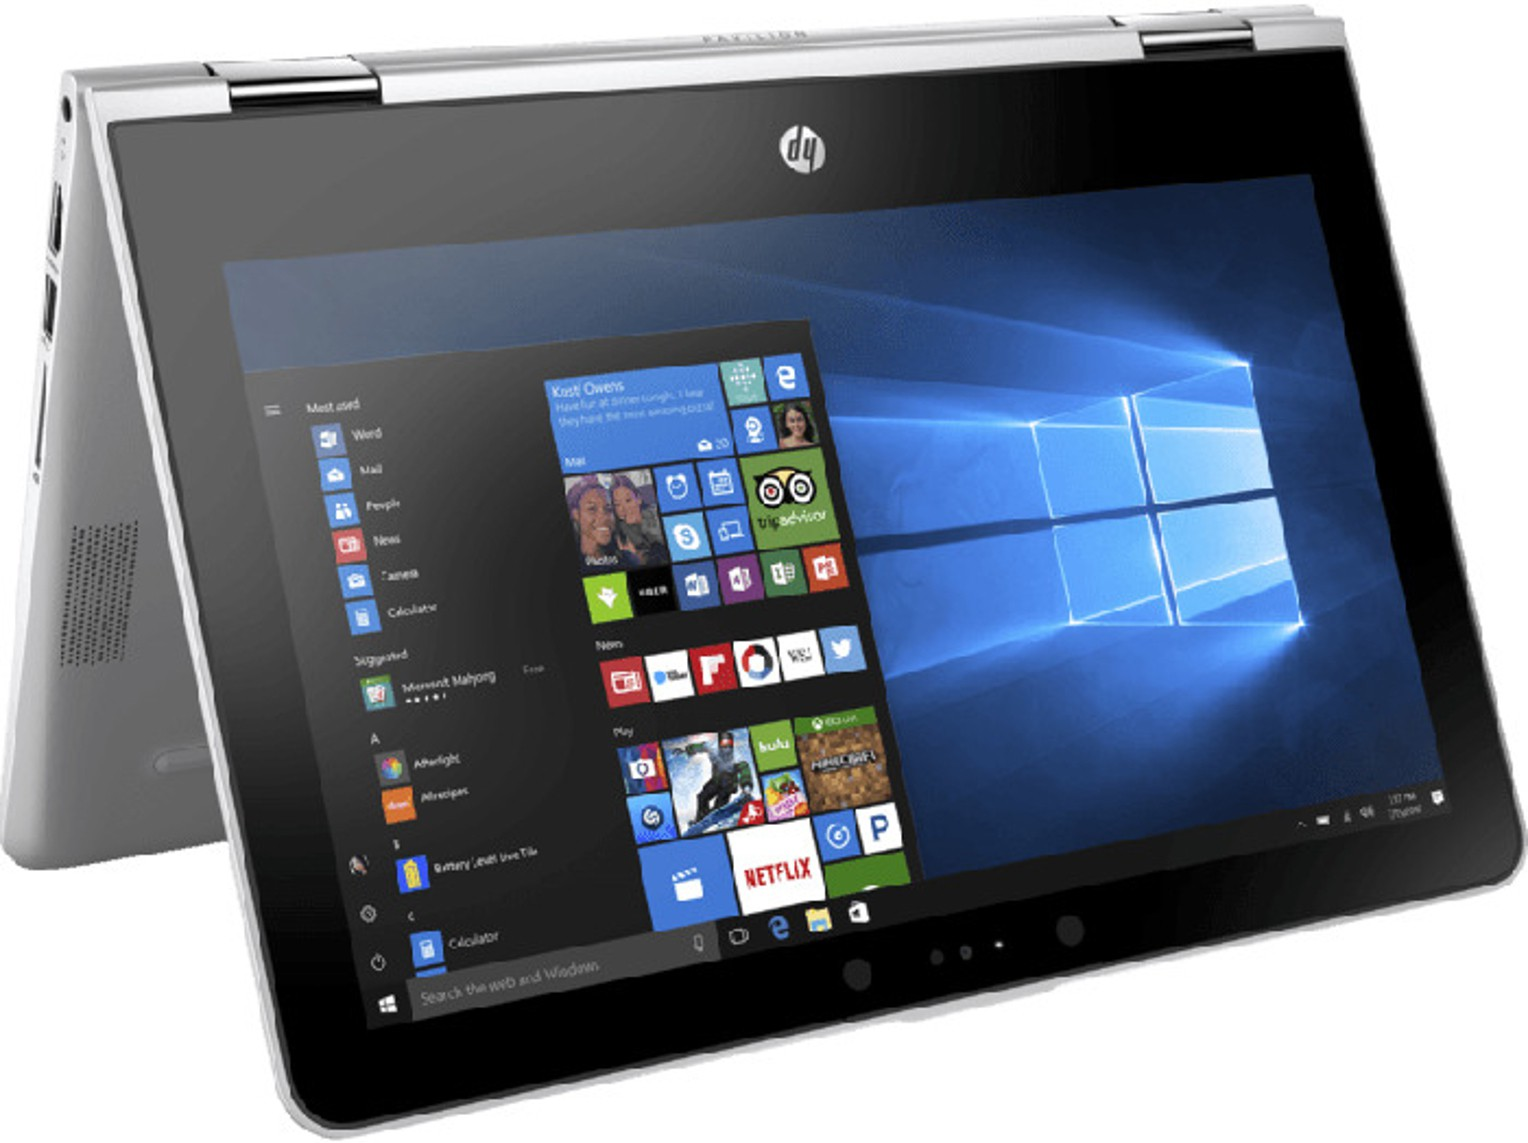 HP Pavilion x360 Core i3 8th Gen 11-ad106tu 2 in 1 Laptop Image